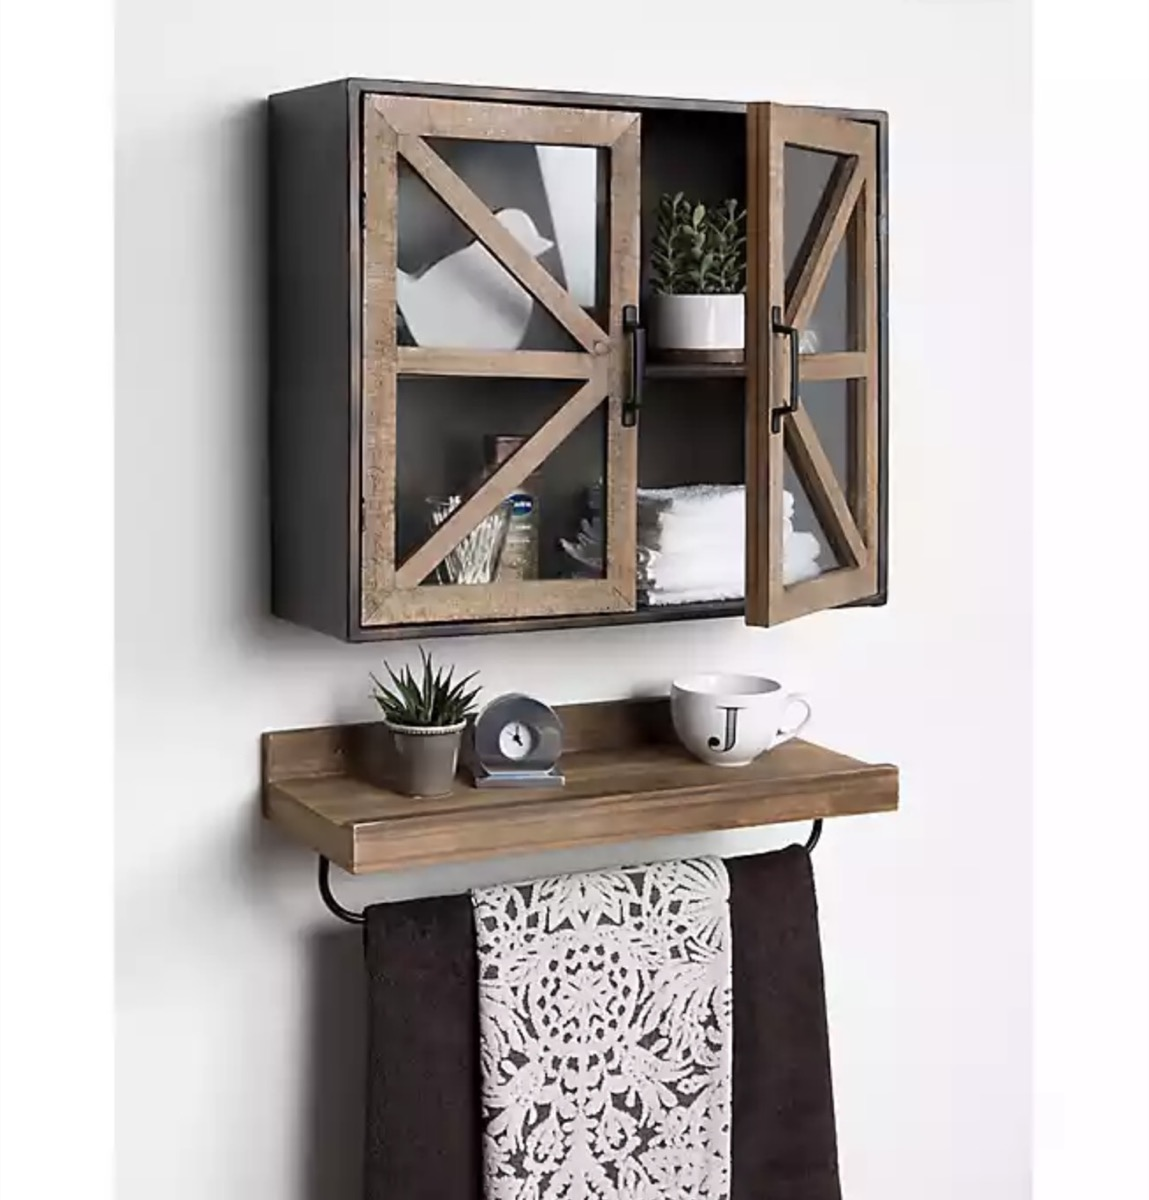 wooden medicine cabinet above wooden shelf, rustic farmhouse decor